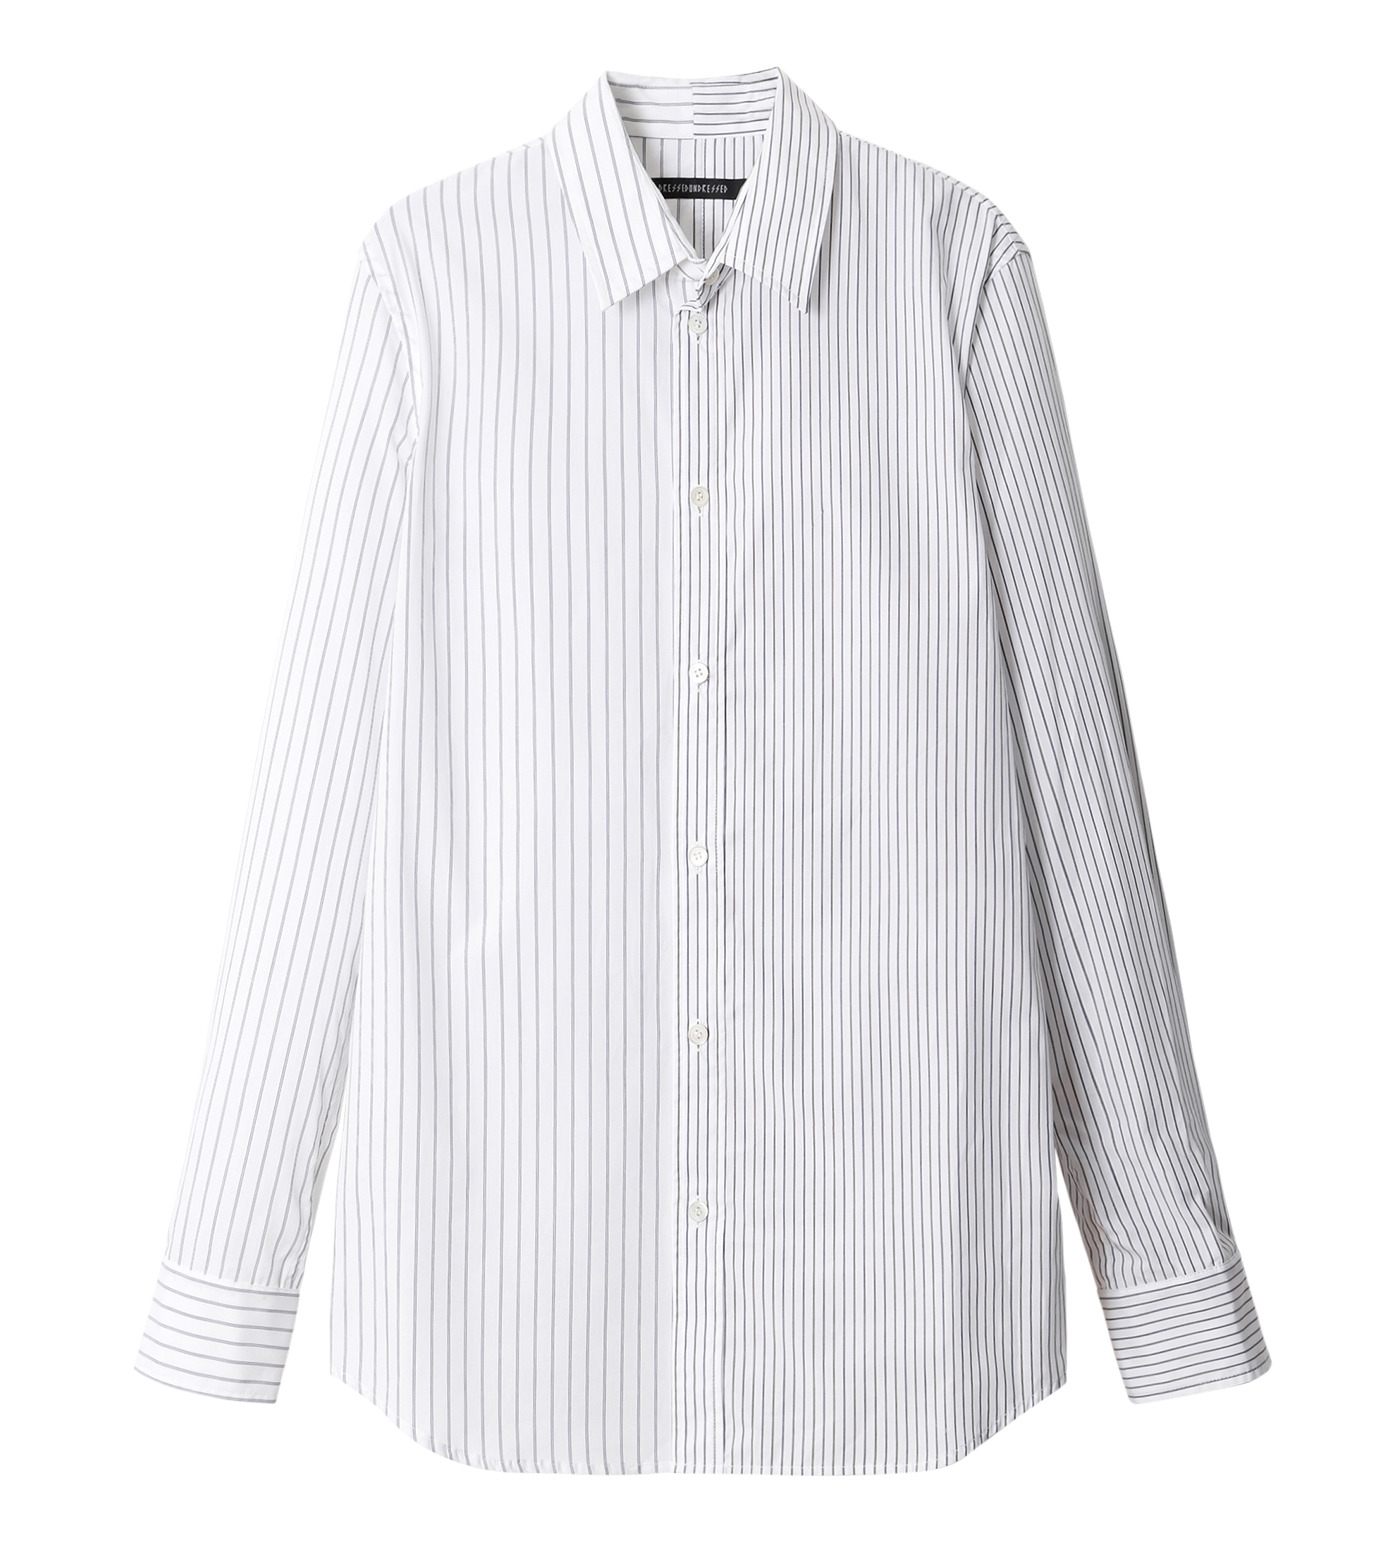 DRESSEDUNDRESSED(ドレスドアンドレスド)のPinstripe Color Block Men's Shirt-WHITE(シャツ/shirt)-DUW16105-4-W 拡大詳細画像1